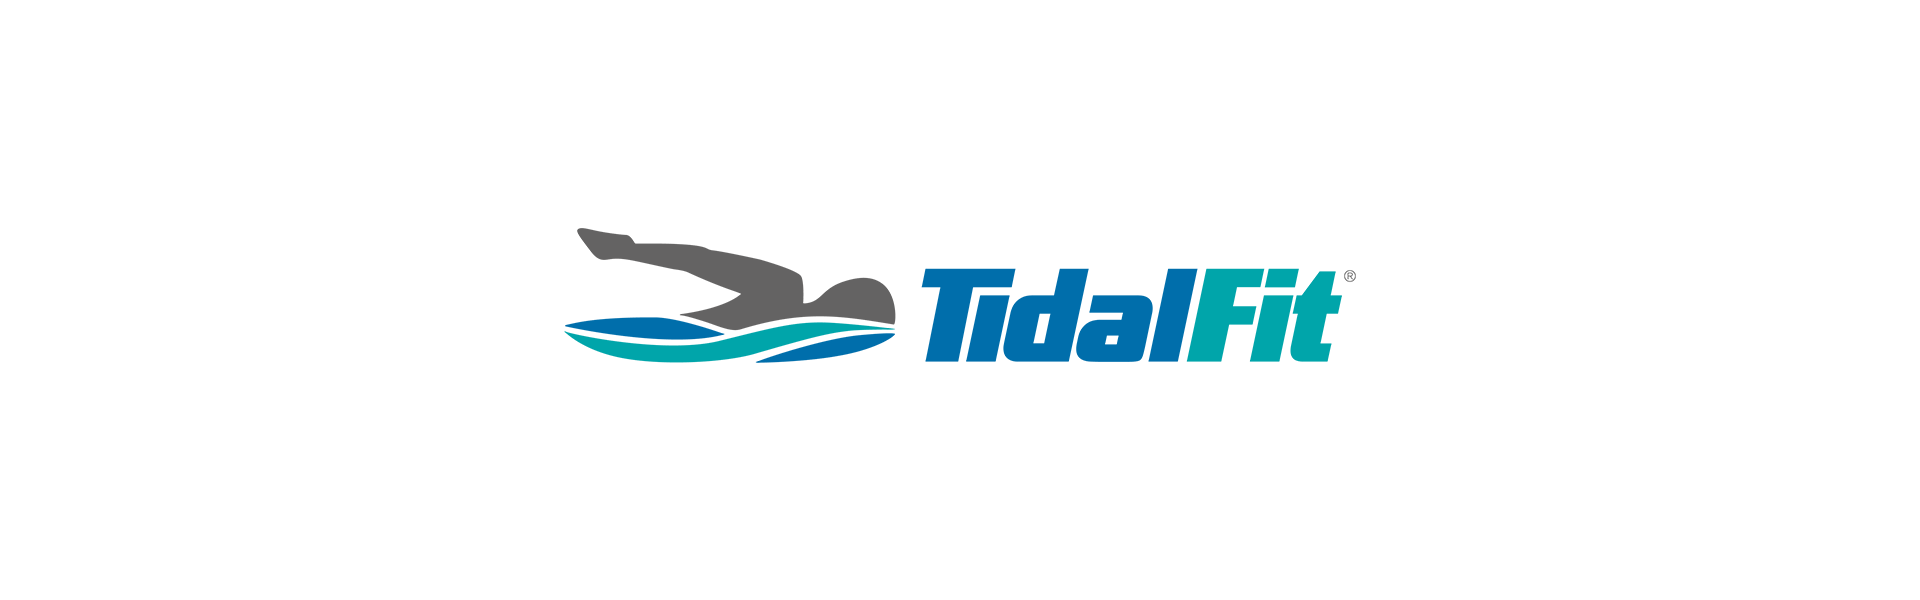 tidalfit-title-logo